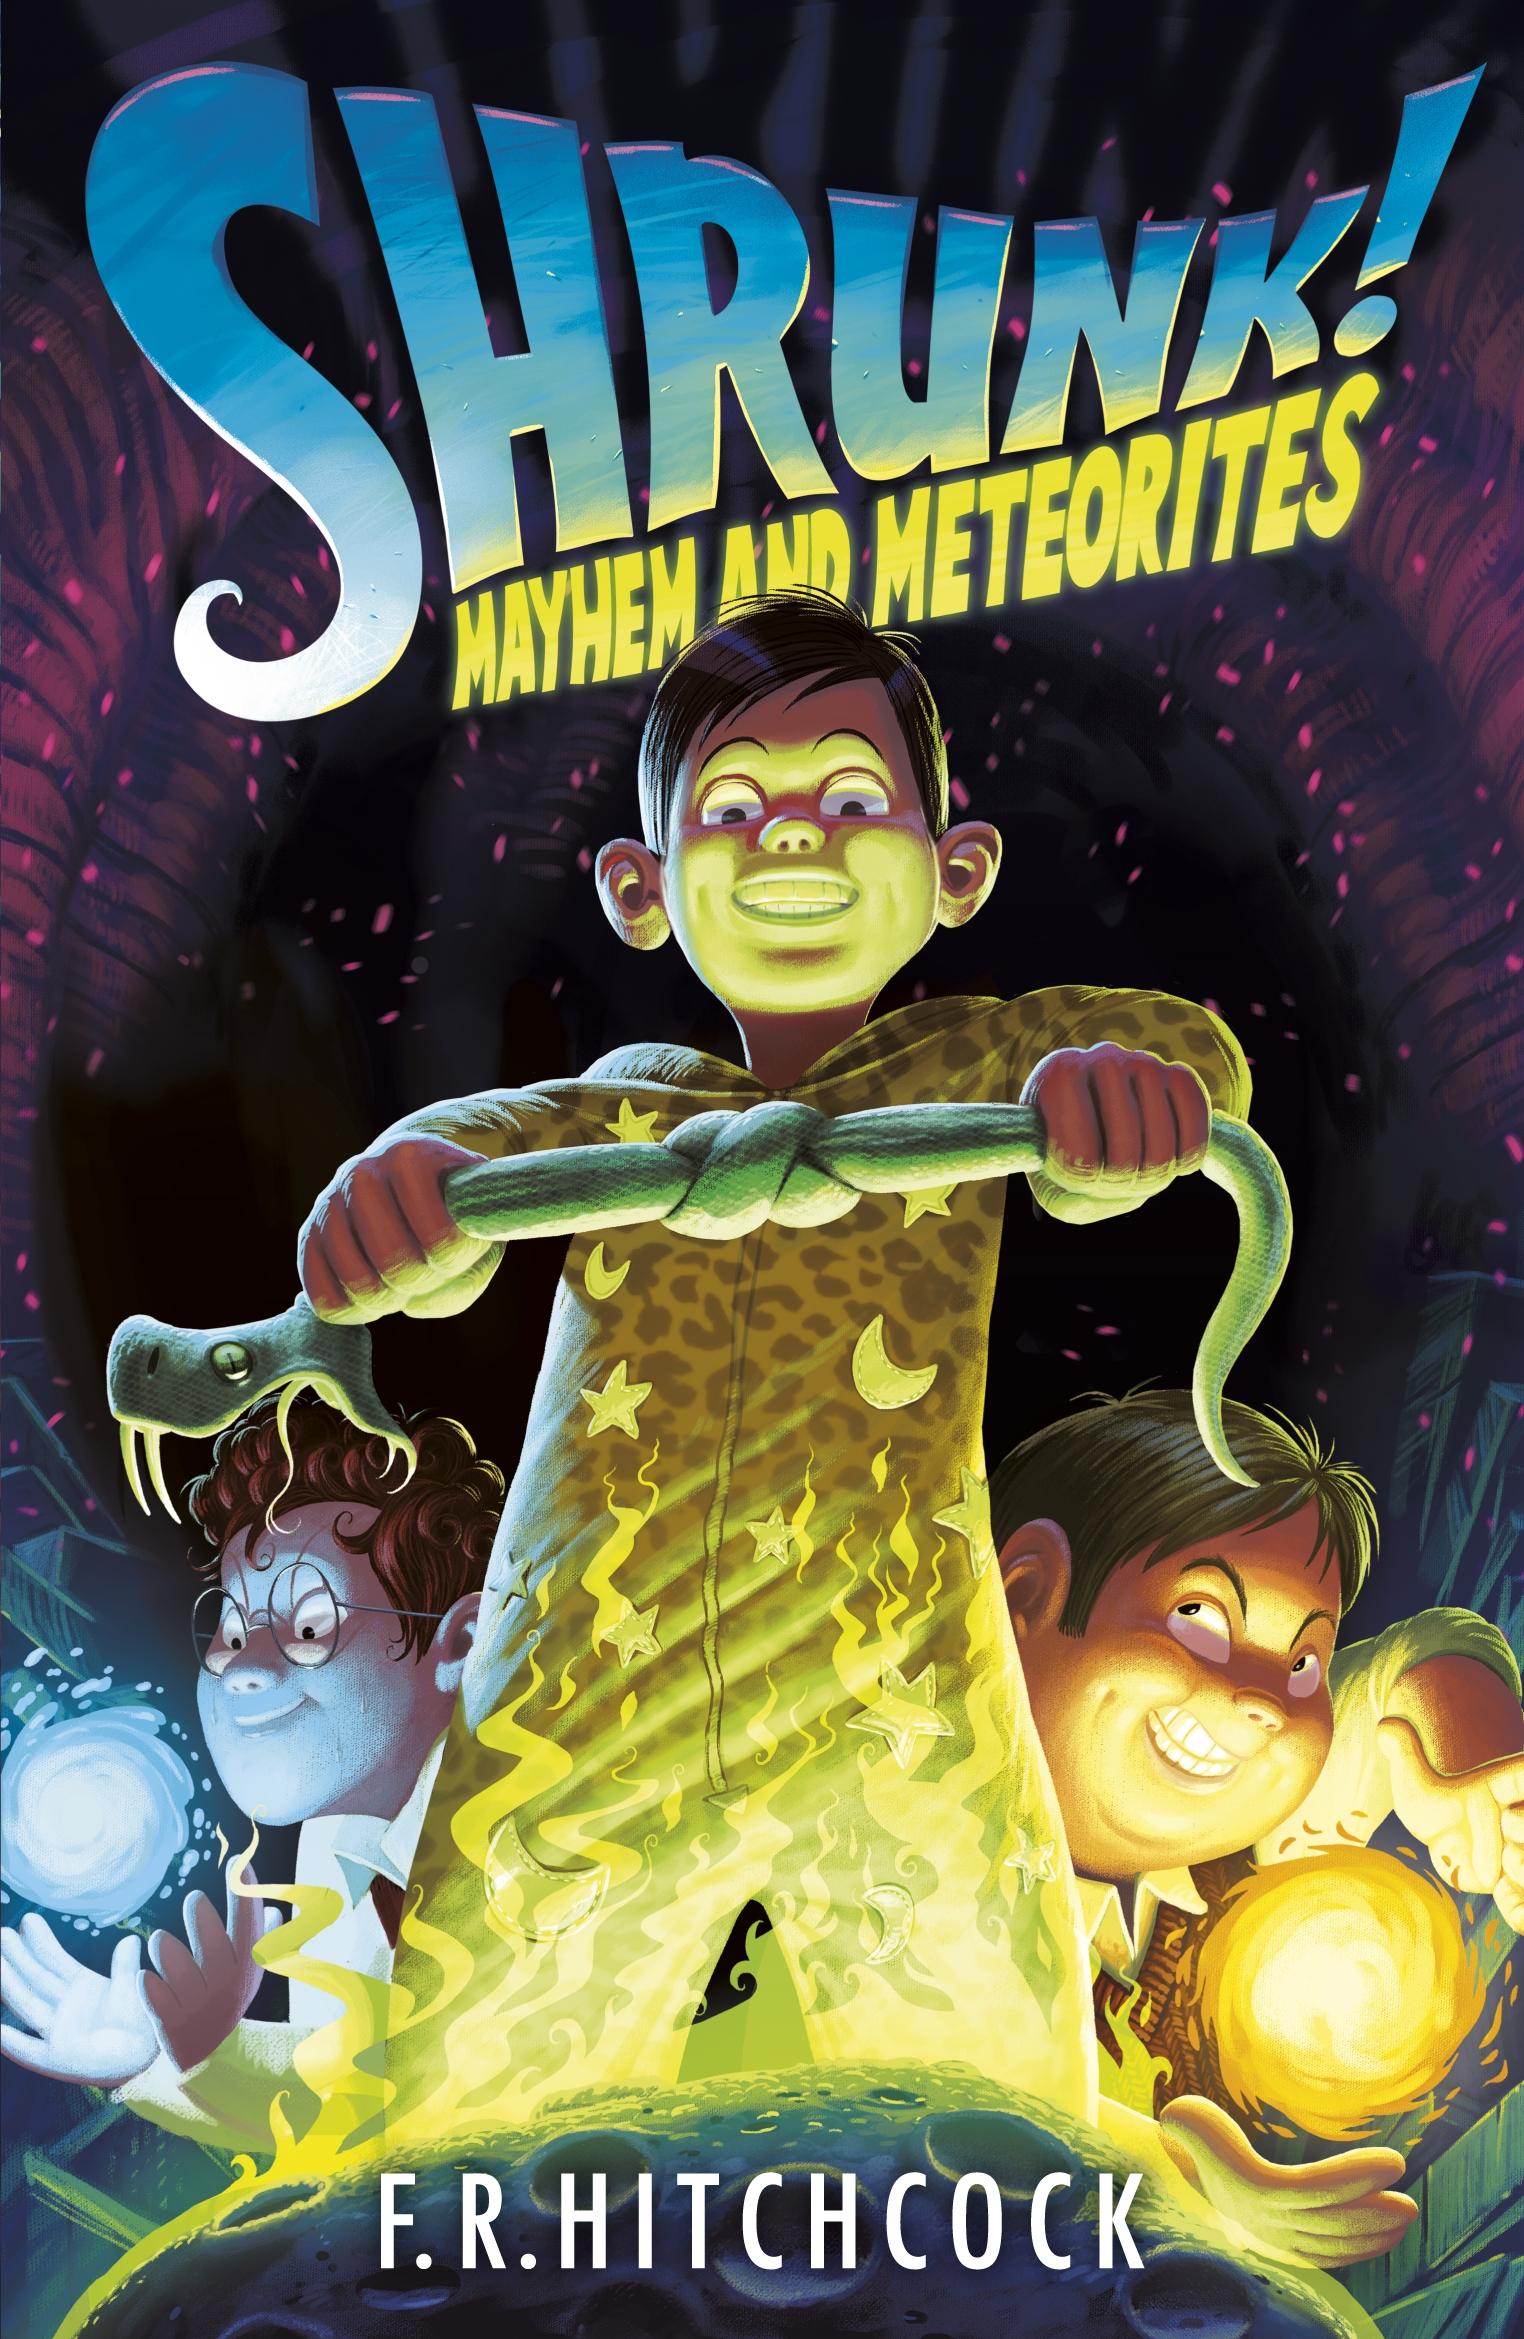 Mayhem and Meteorites: A SHRUNK! Adventure by Fleur Hitchcock